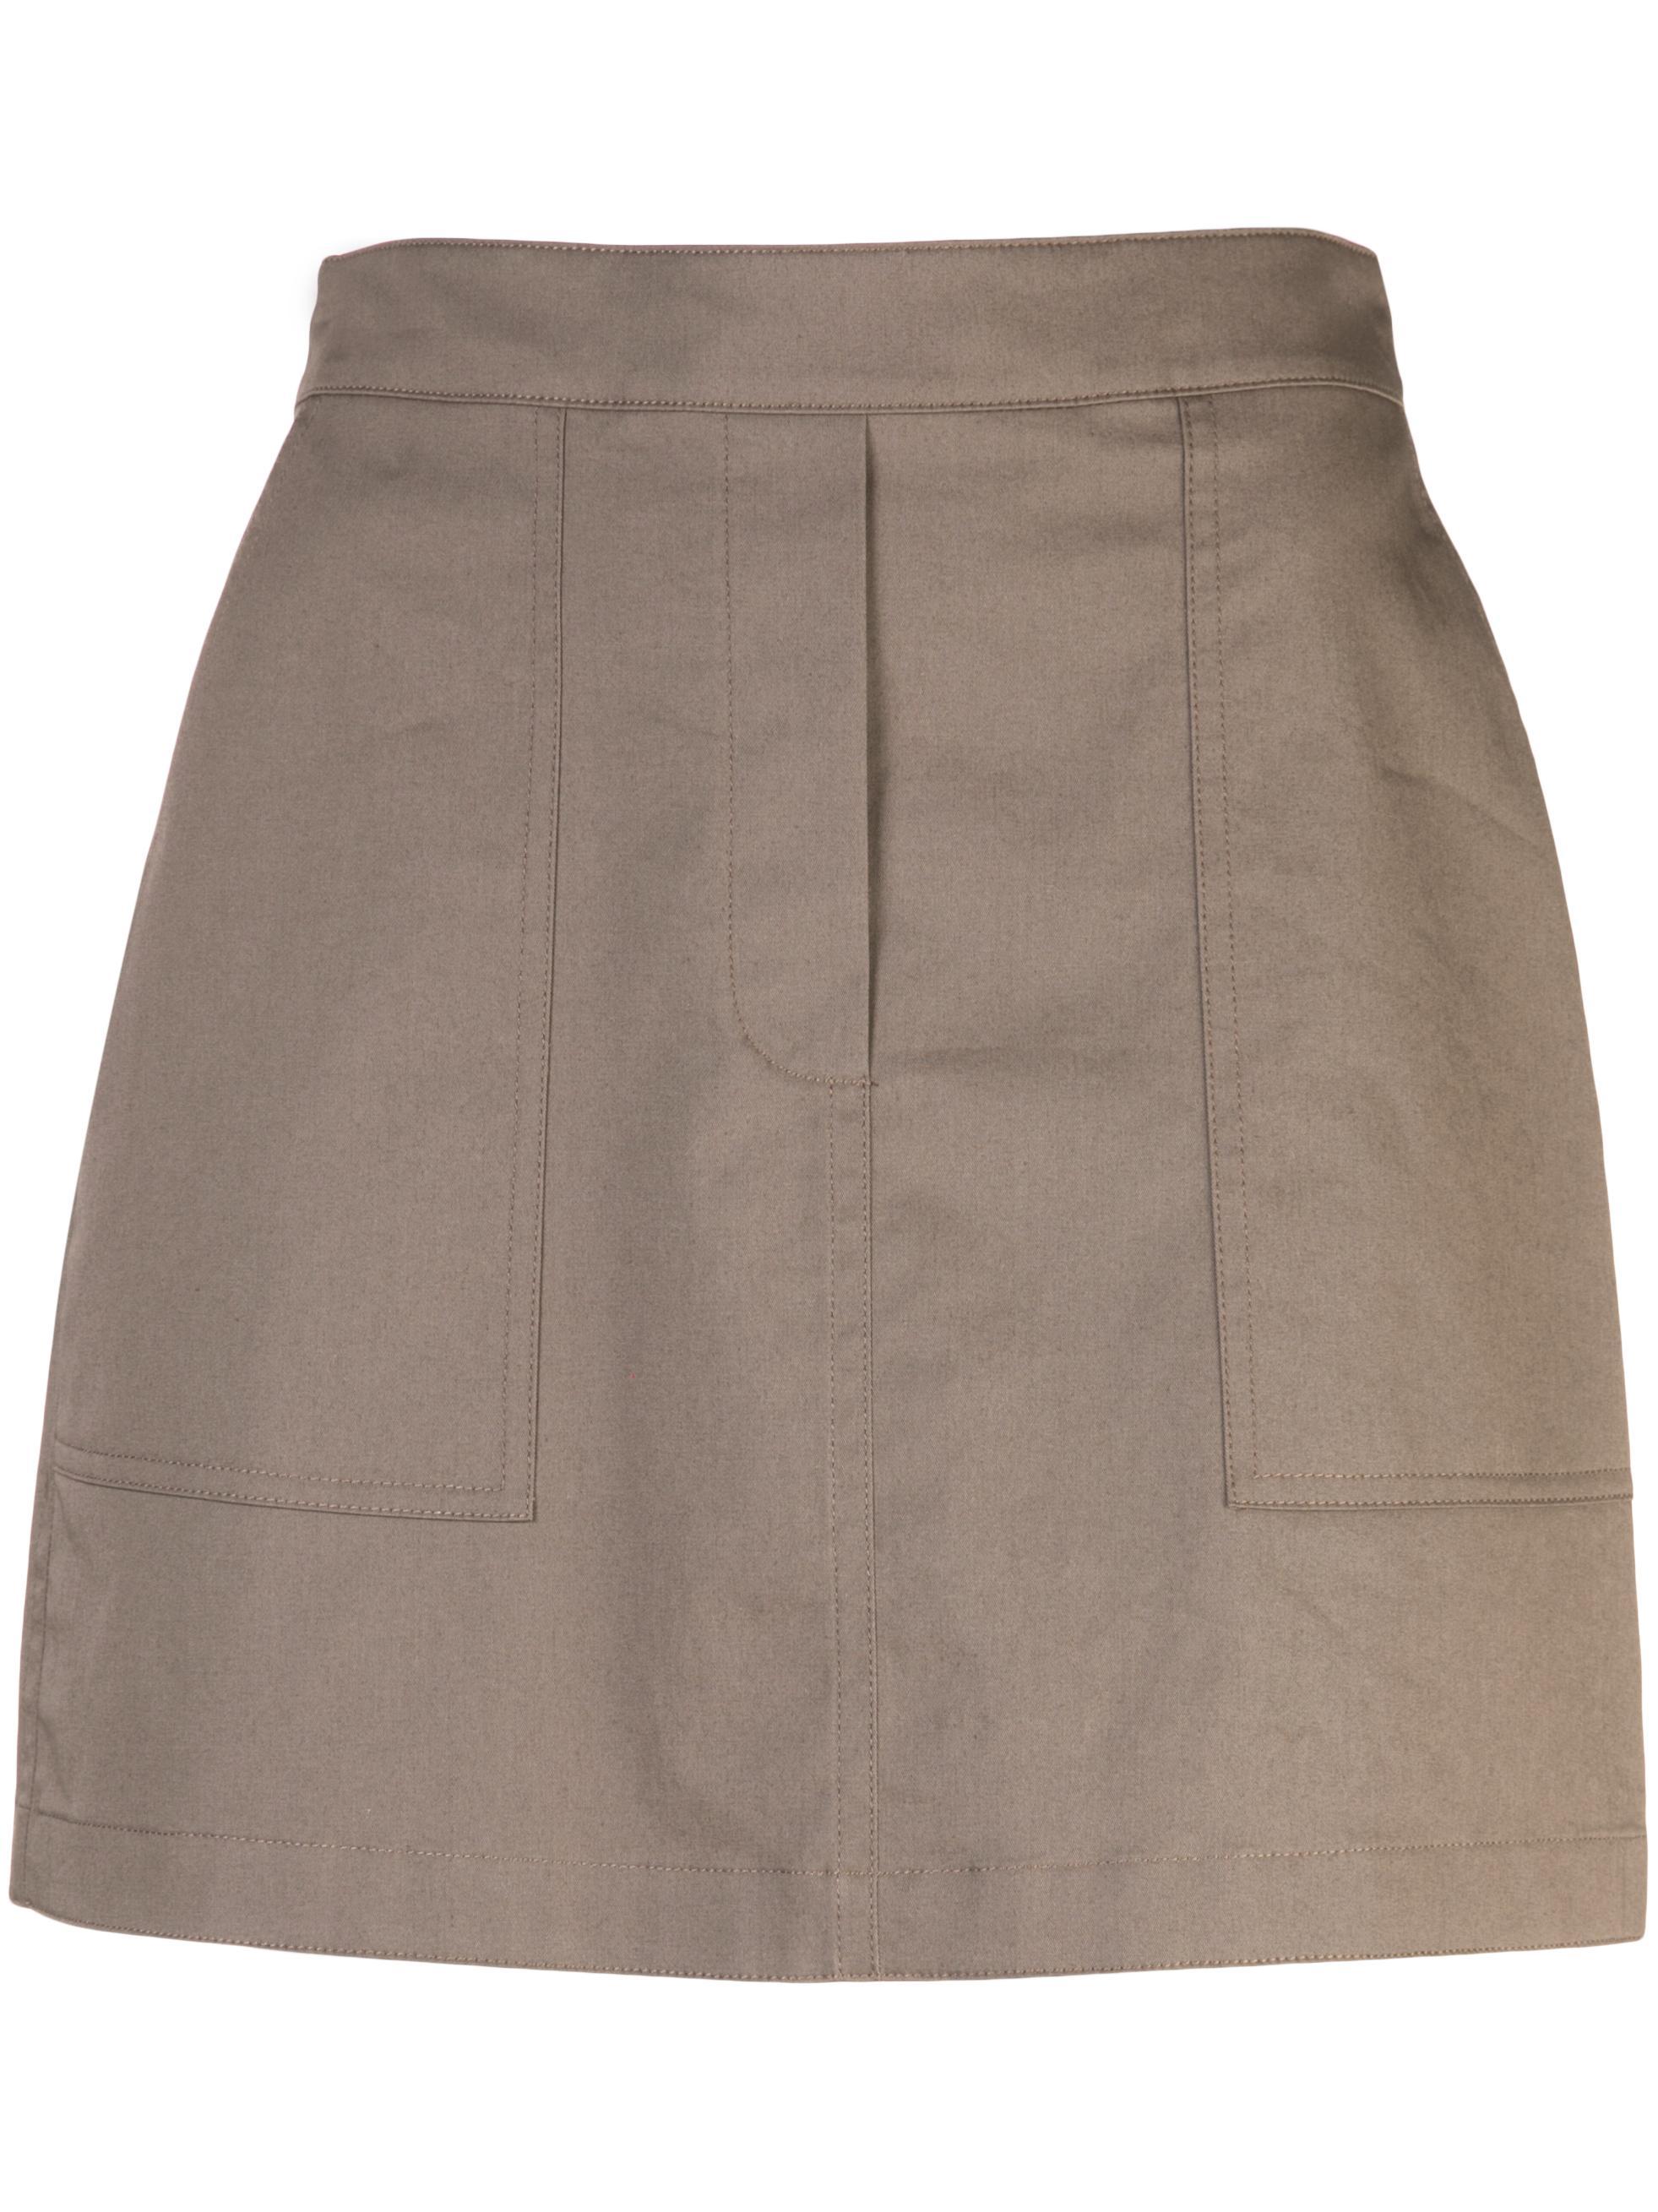 Stitched Pocket High Waist Mini Skirt